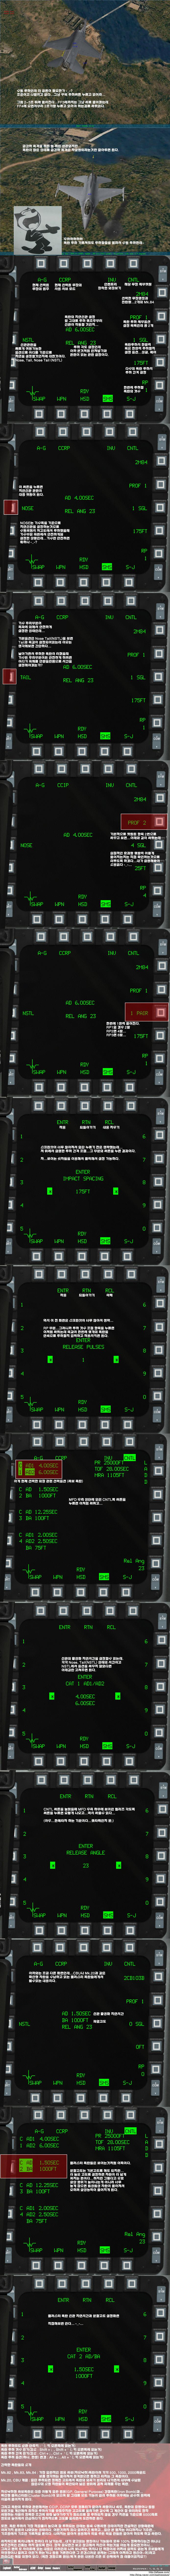 manual_14_bomb4.jpg